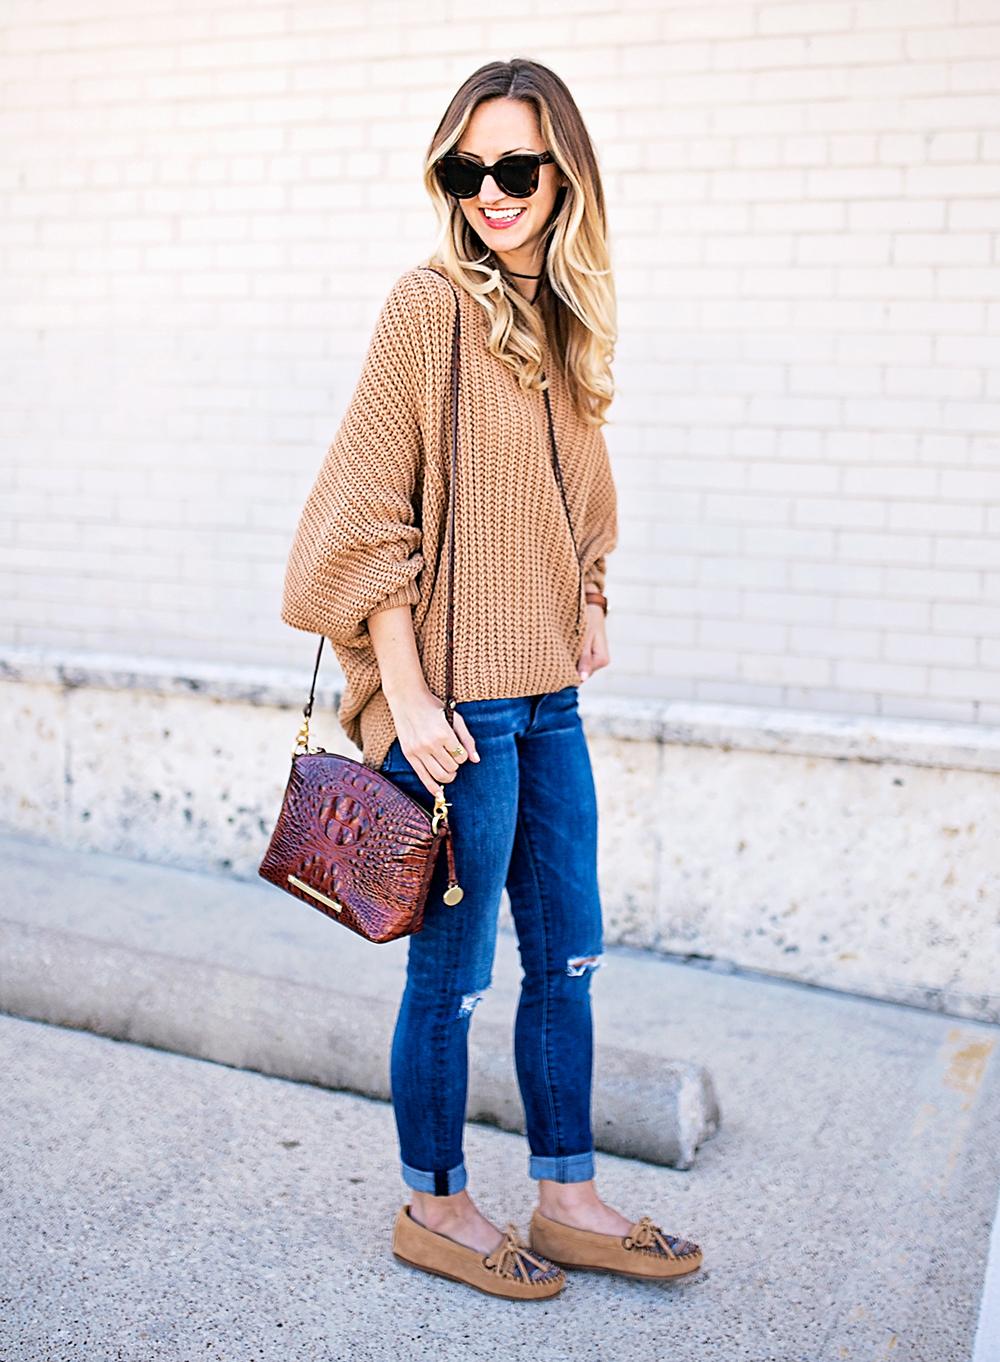 livvyland-blog-olivia-watson-slouchy-oversize-knit-sweater-minnetonka-el-paso-ii-moccasin-boho-outfit-9